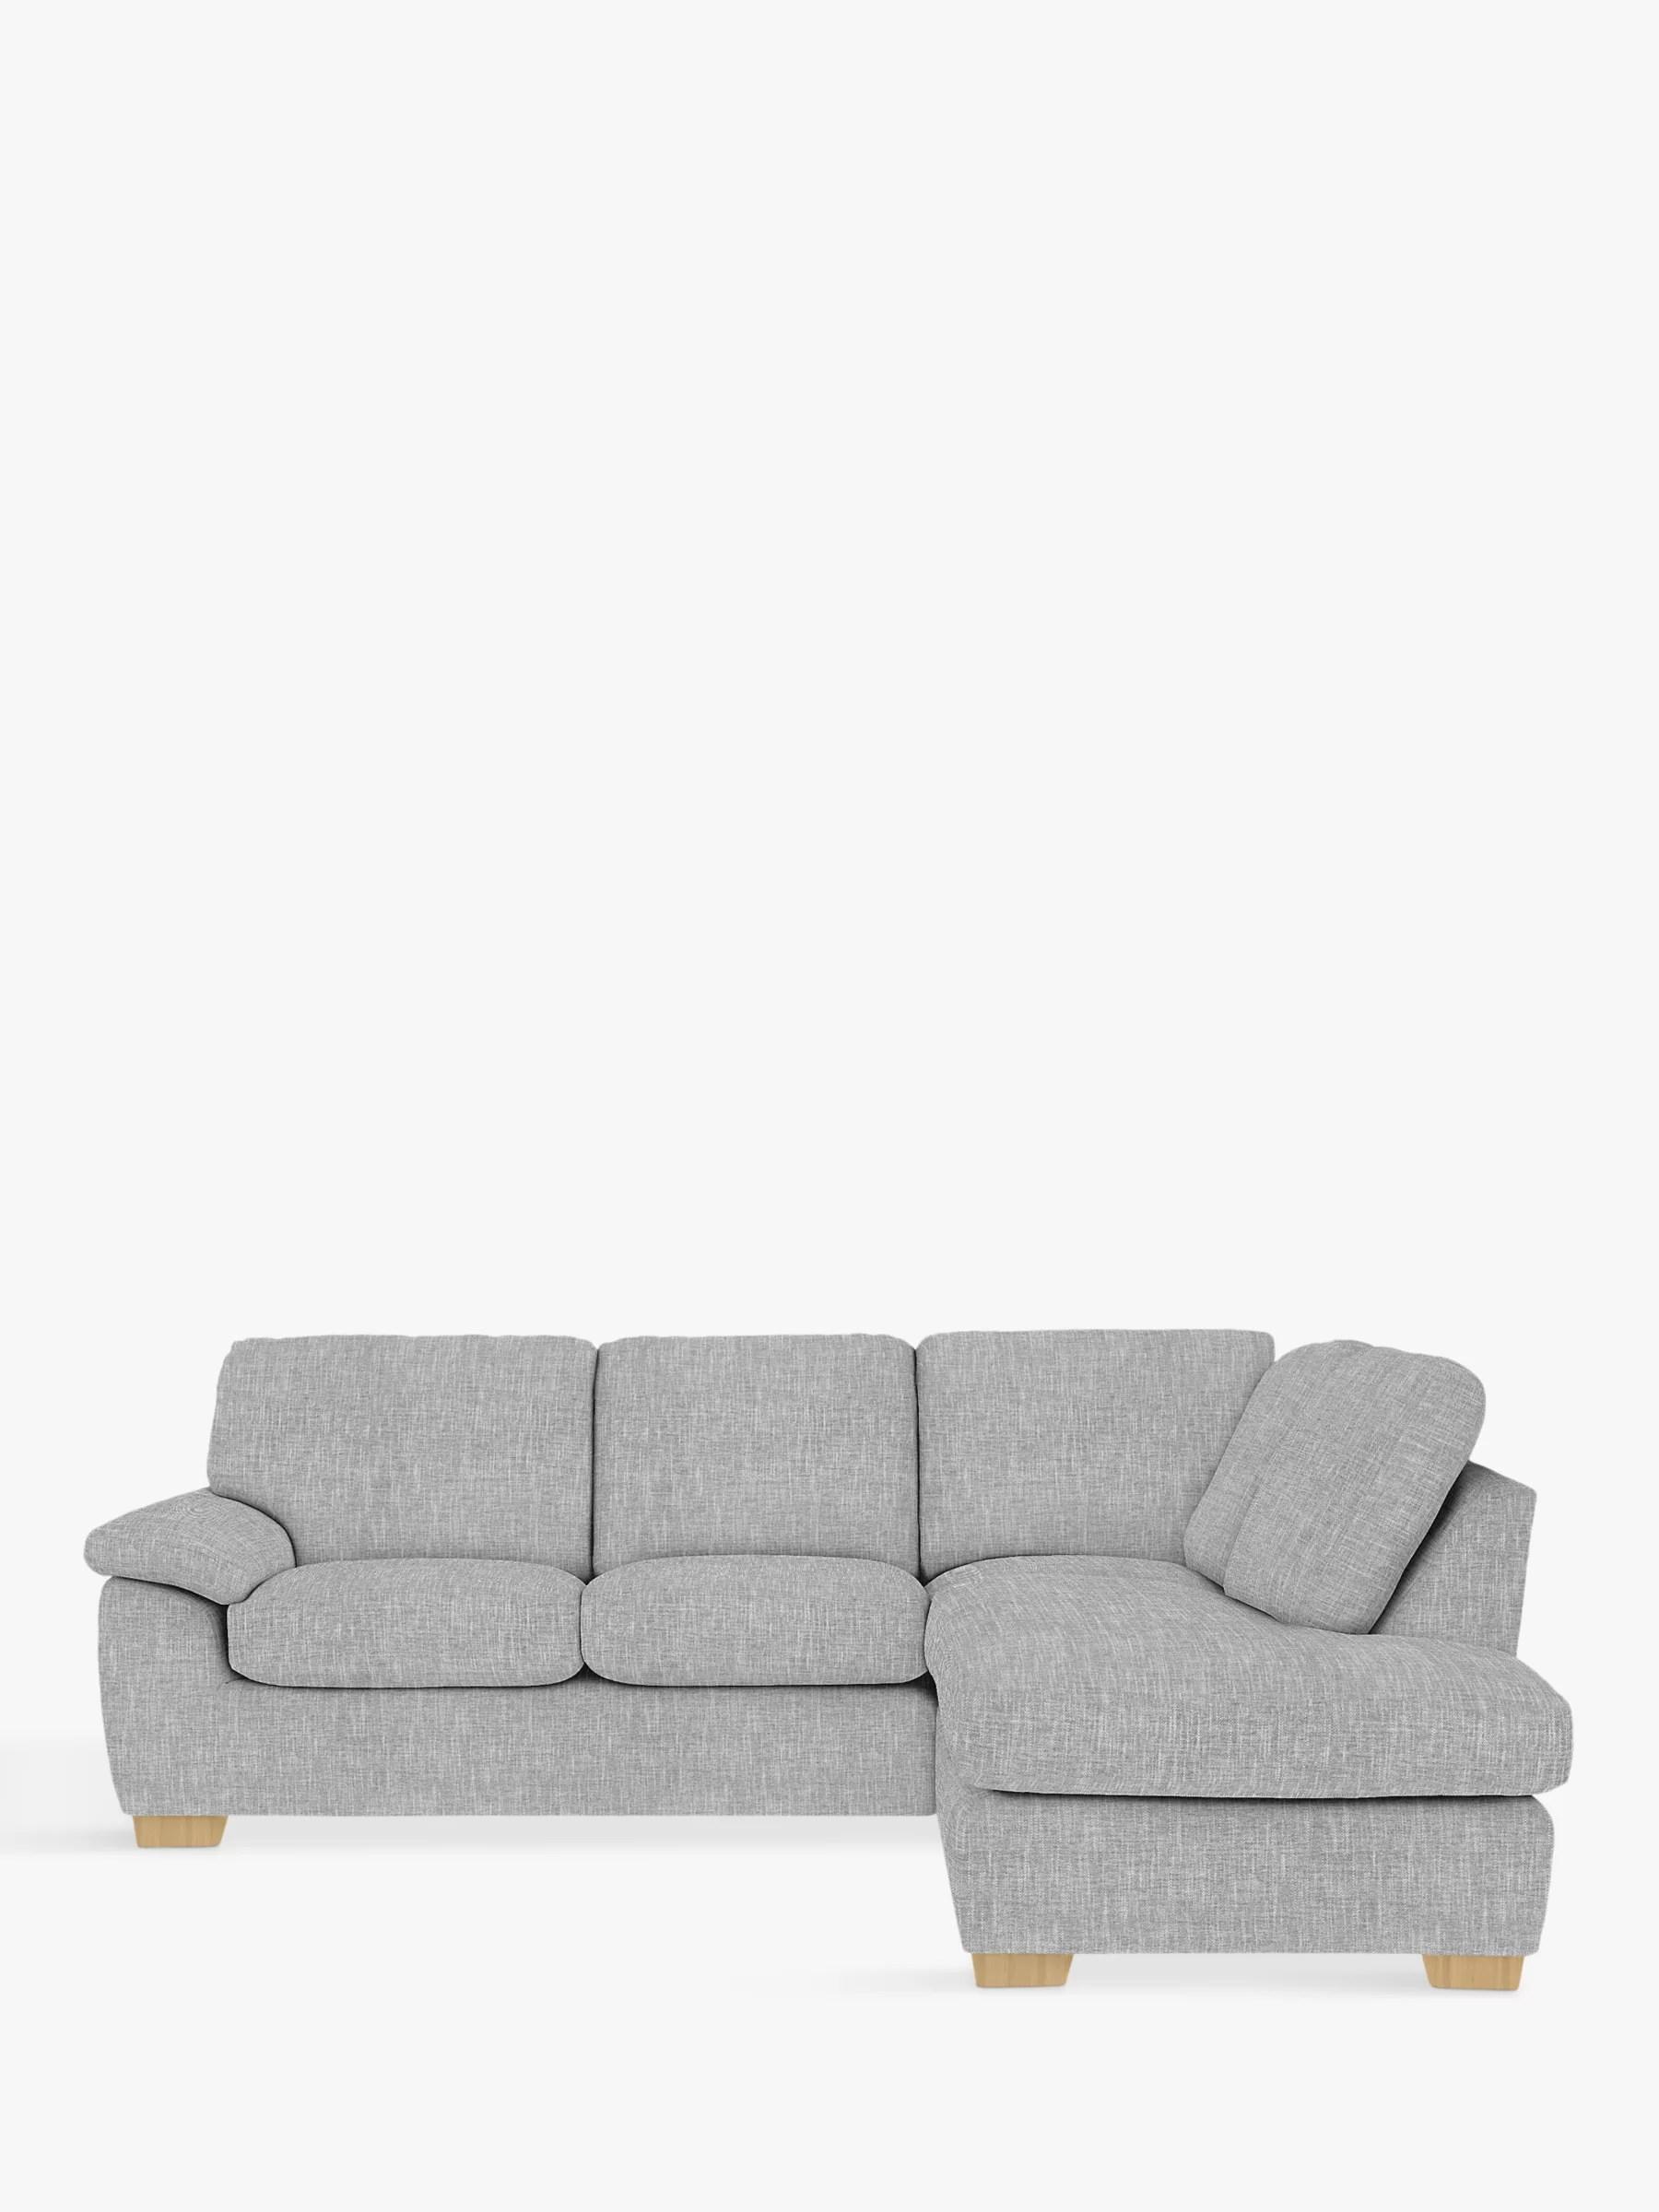 camden sofa john lewis back pillows rhf corner end chaise unit light leg at